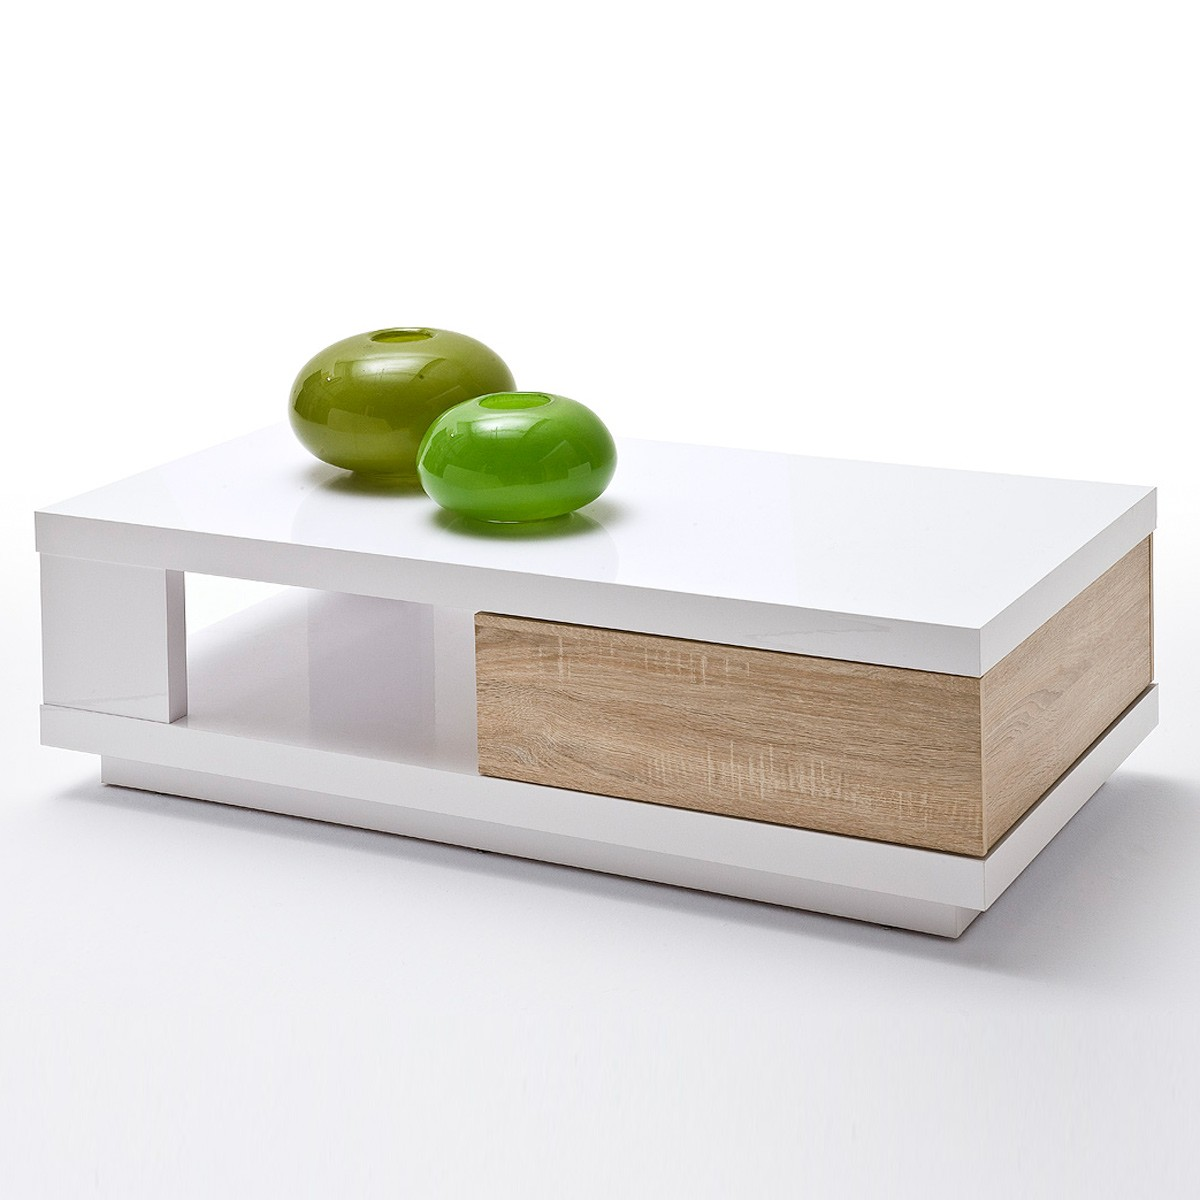 kategorien tische couchtische b2b trade. Black Bedroom Furniture Sets. Home Design Ideas